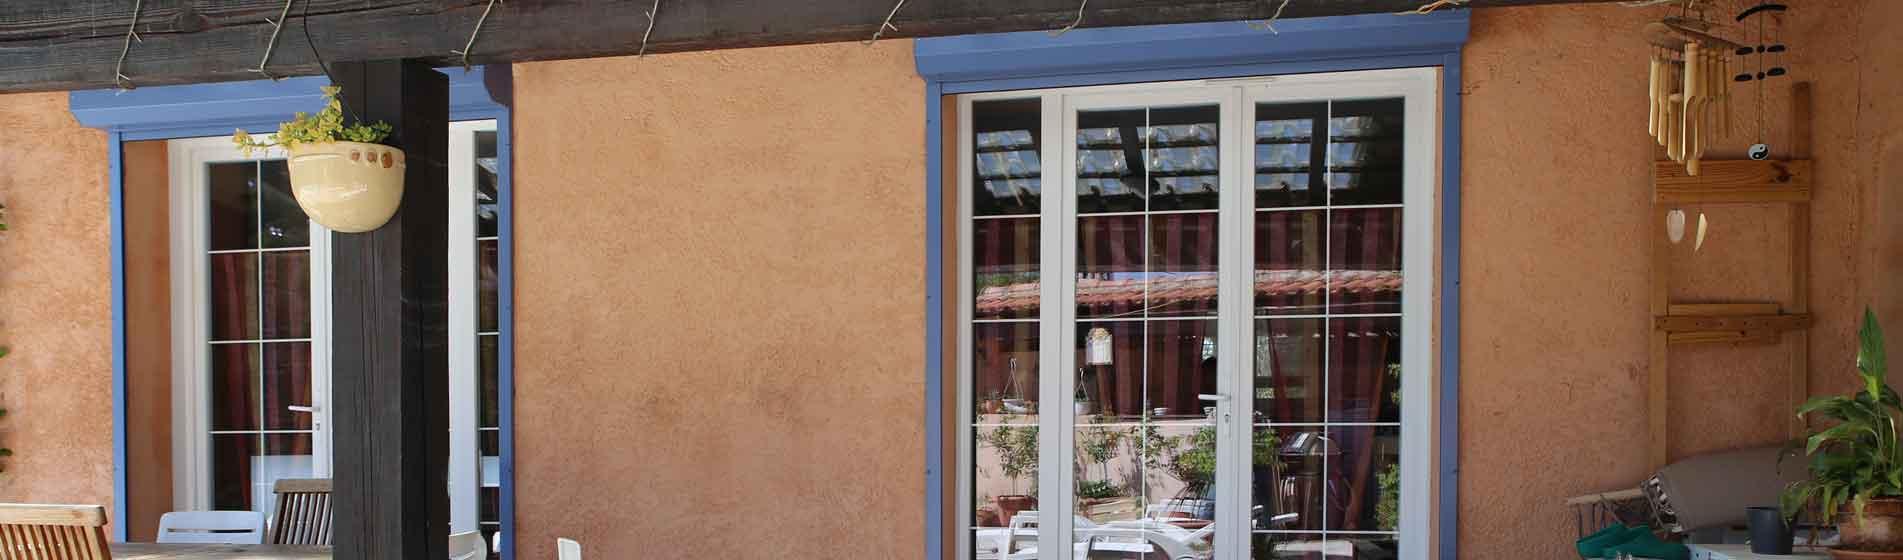 achat porte fenêtre alu 13 Bouches-du-Rhône